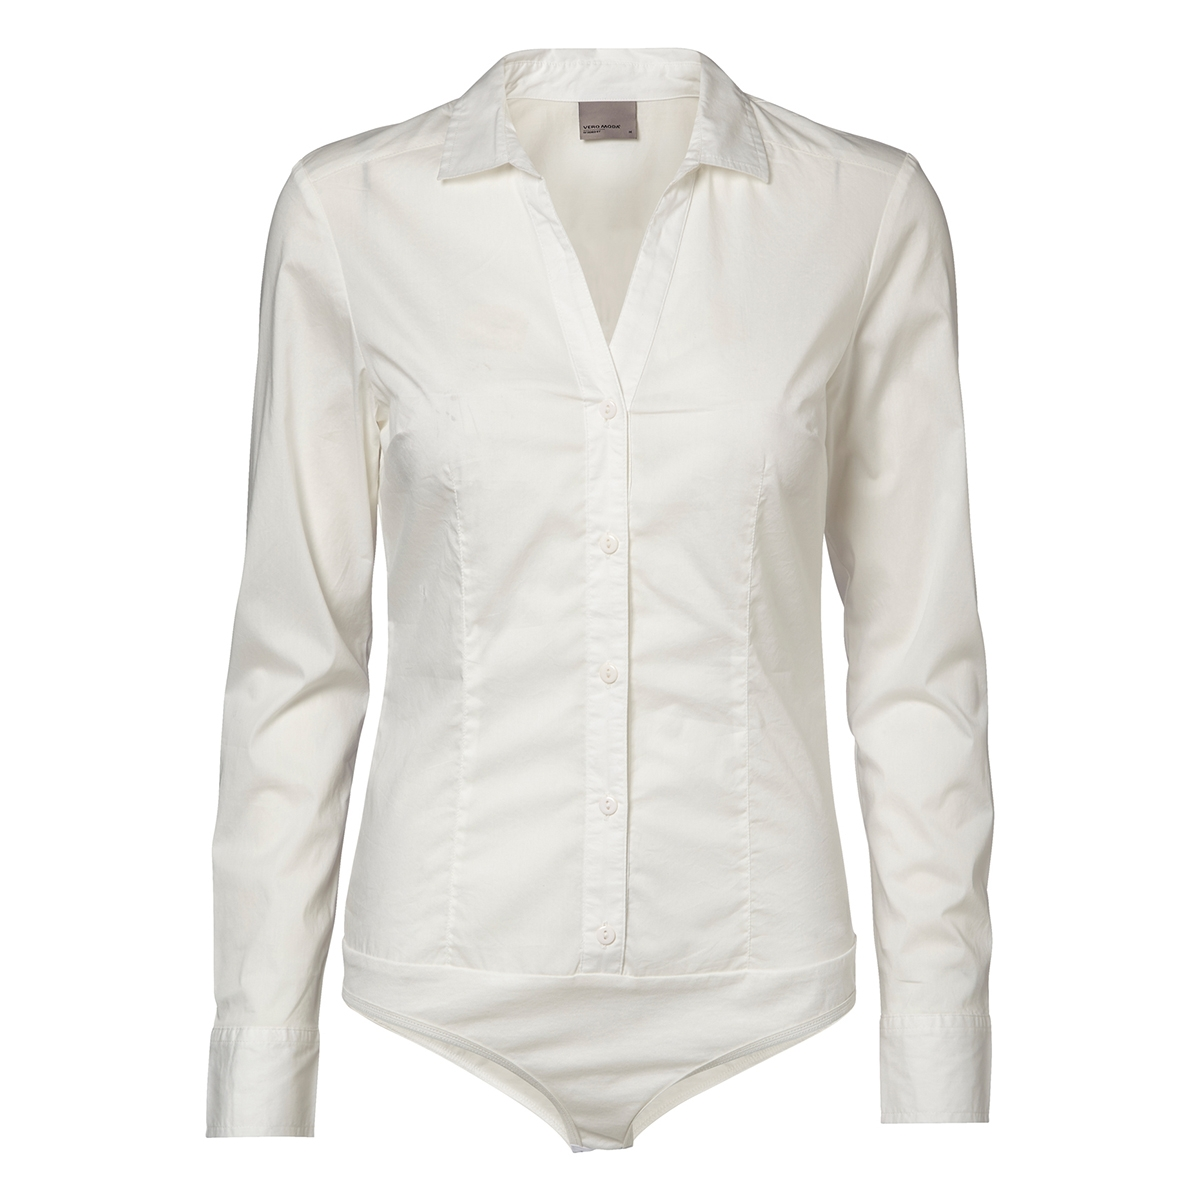 vmlady l/s g-string 10145522 vero moda blouse snow white